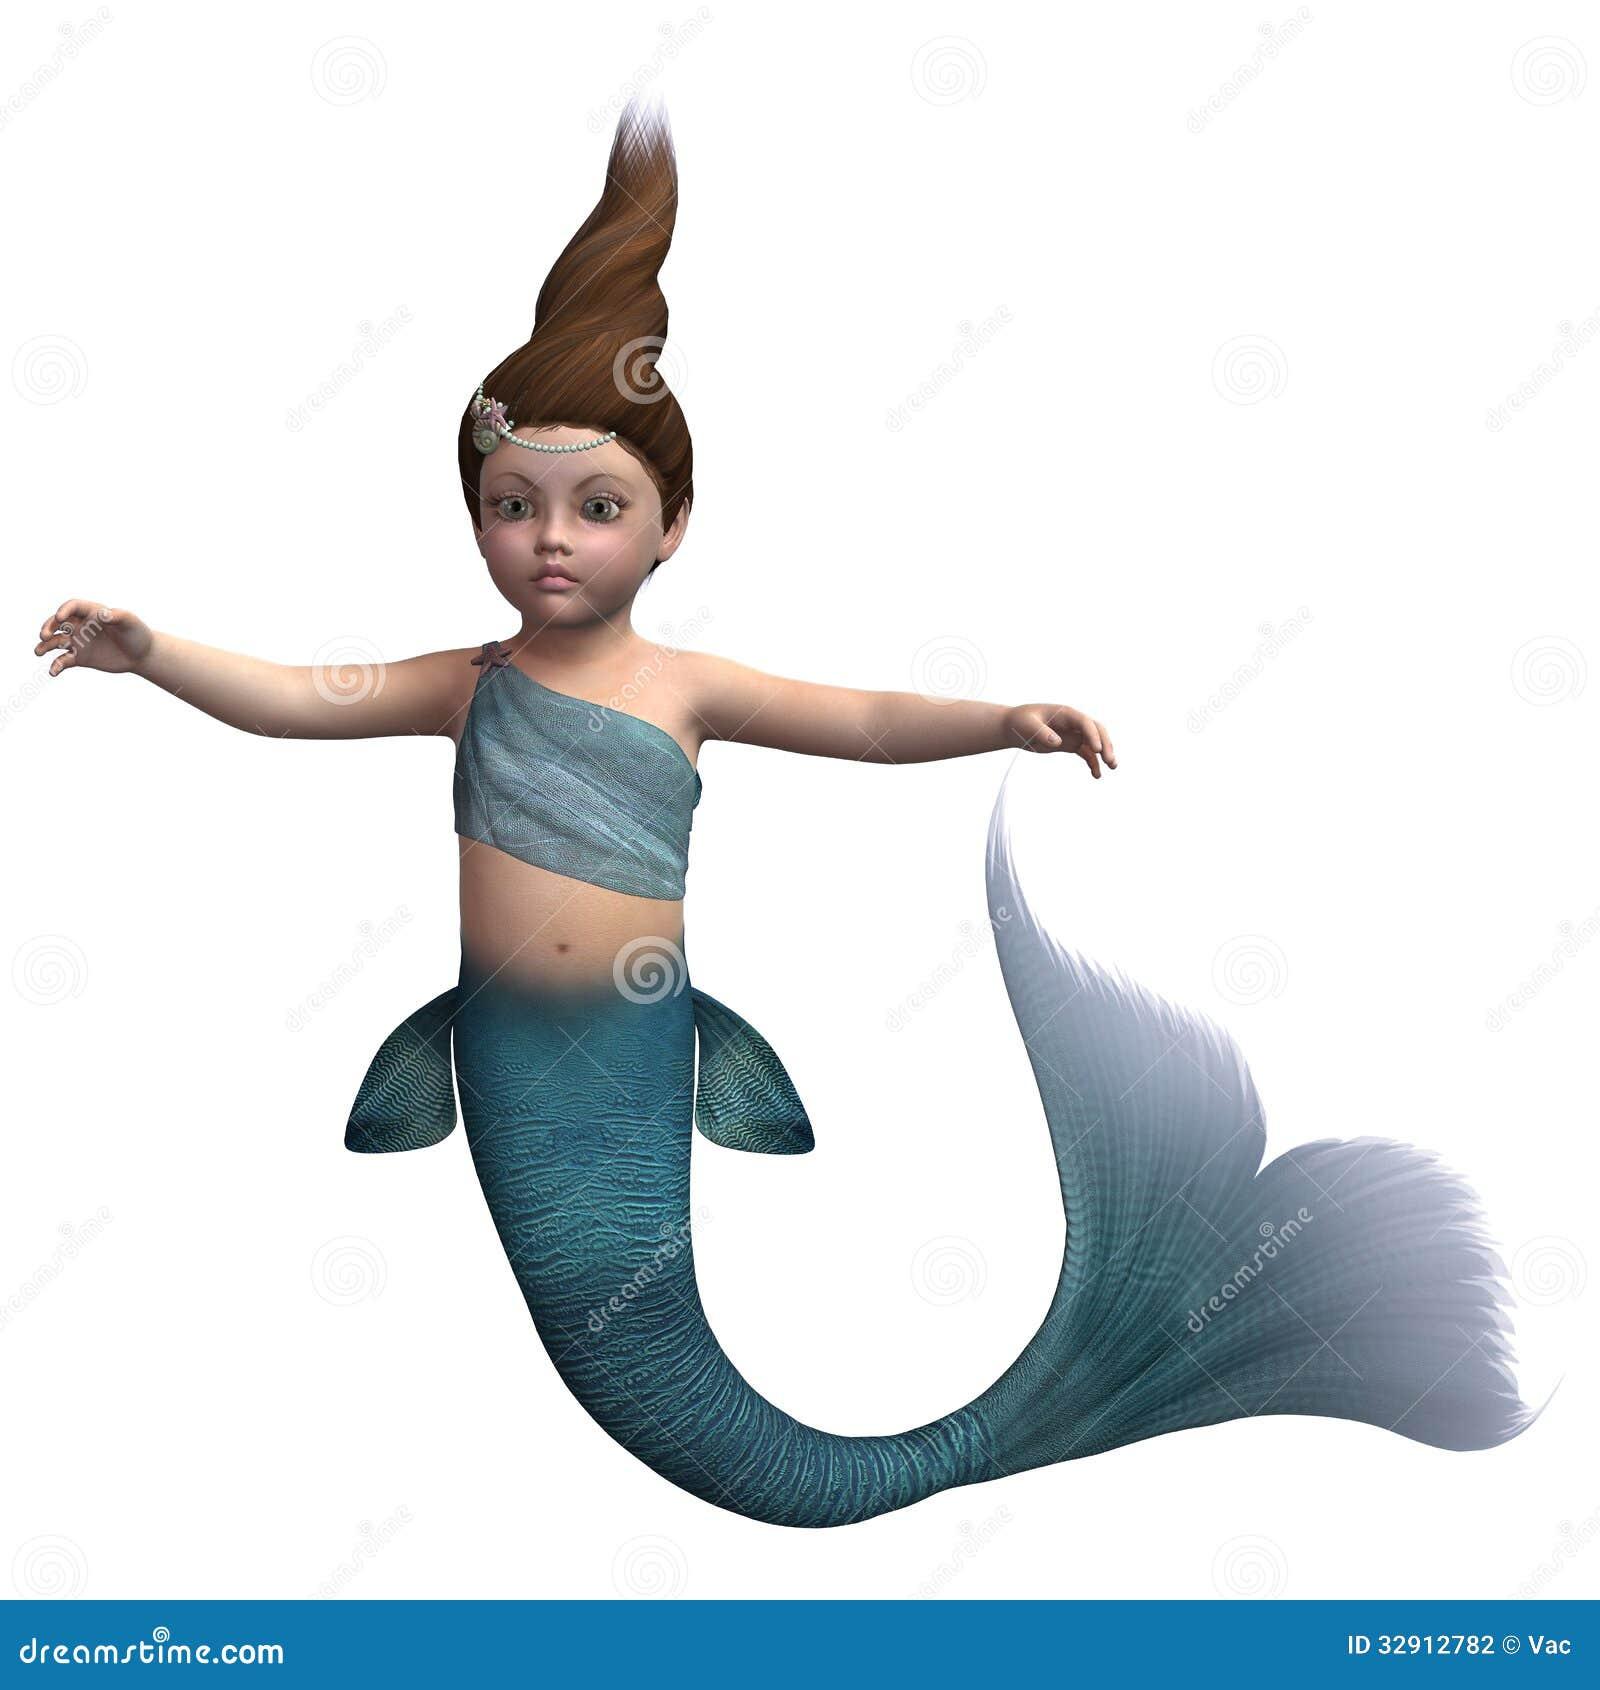 A little mermaid extended teaser - 2 10